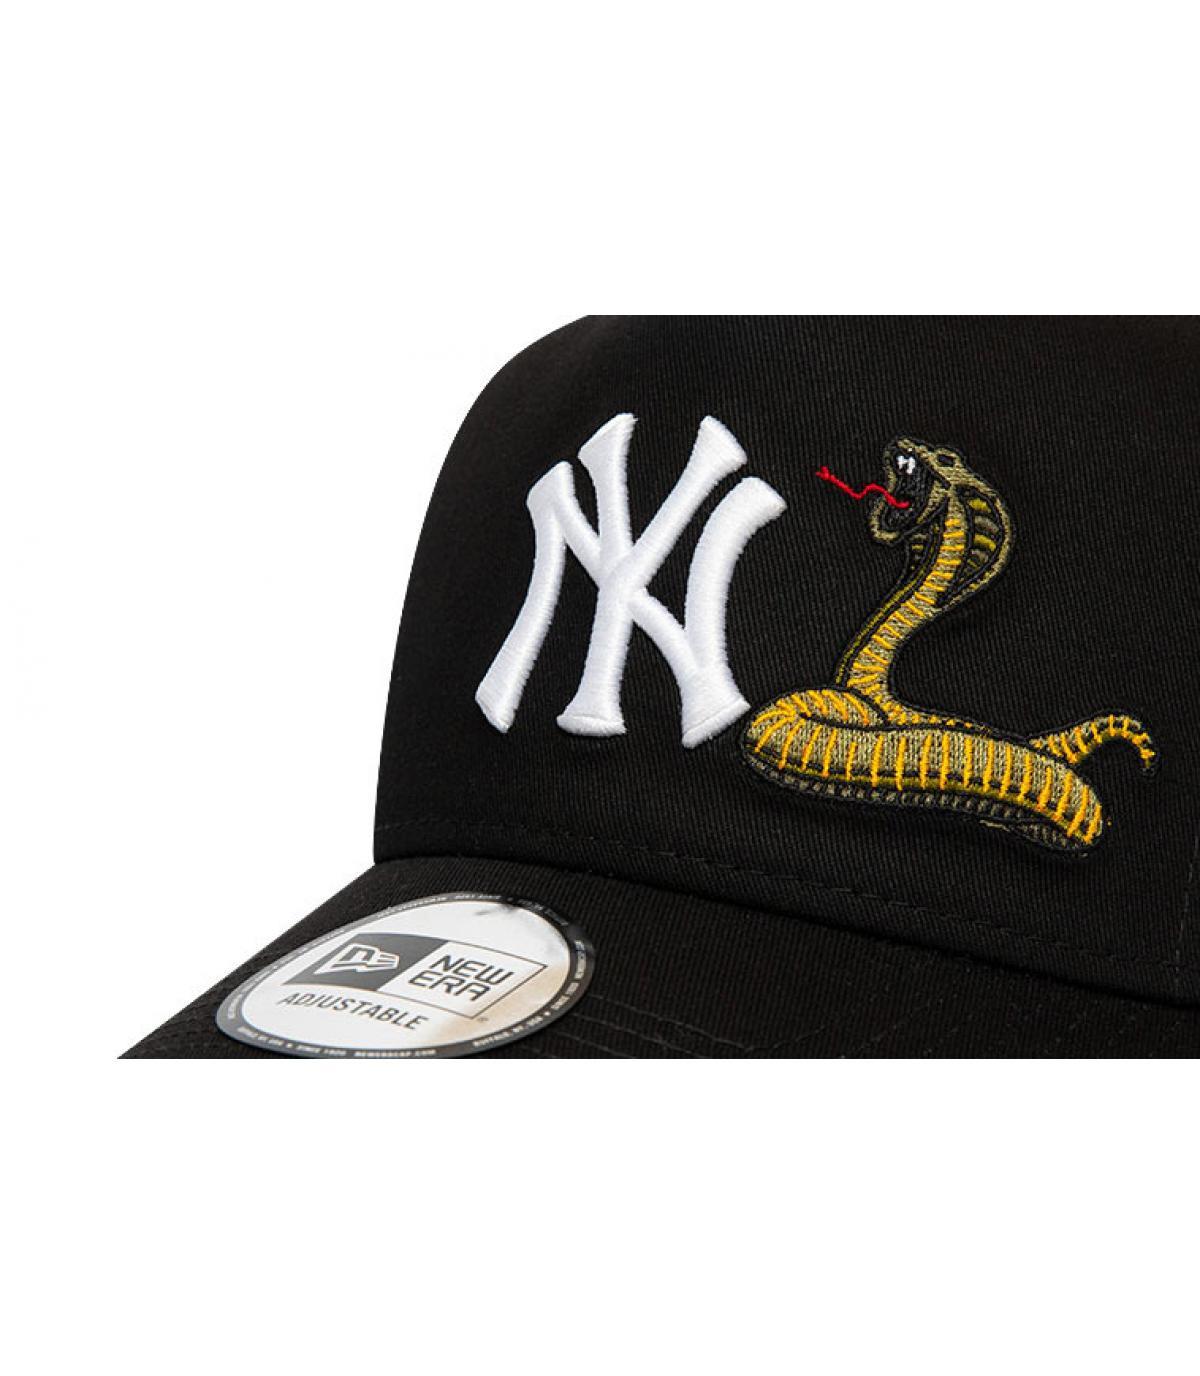 Details Trucker MLB Twine NY black - Abbildung 3